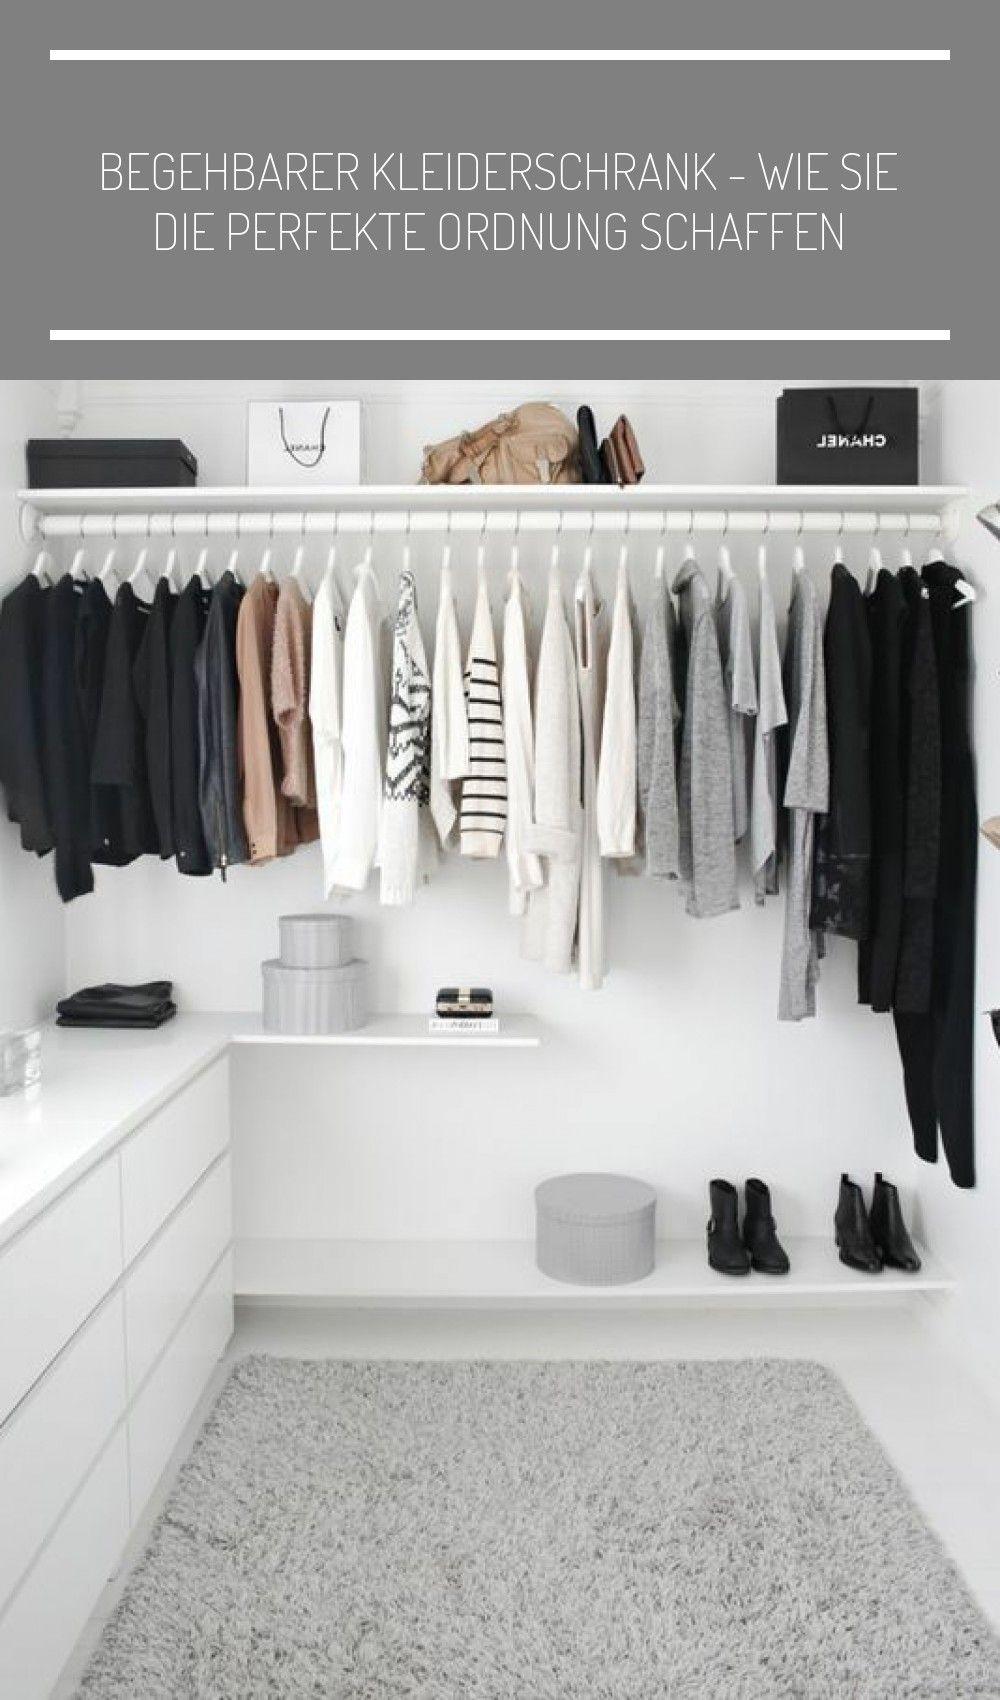 Begehbearer Kleiderschrank Naturfarben Ankleidezimmer Klein Begehbarer Kleiderschrank Wie Sie Die Perfekte Ordnung S In 2020 Closet Inspiration Open Closet Wardrobe